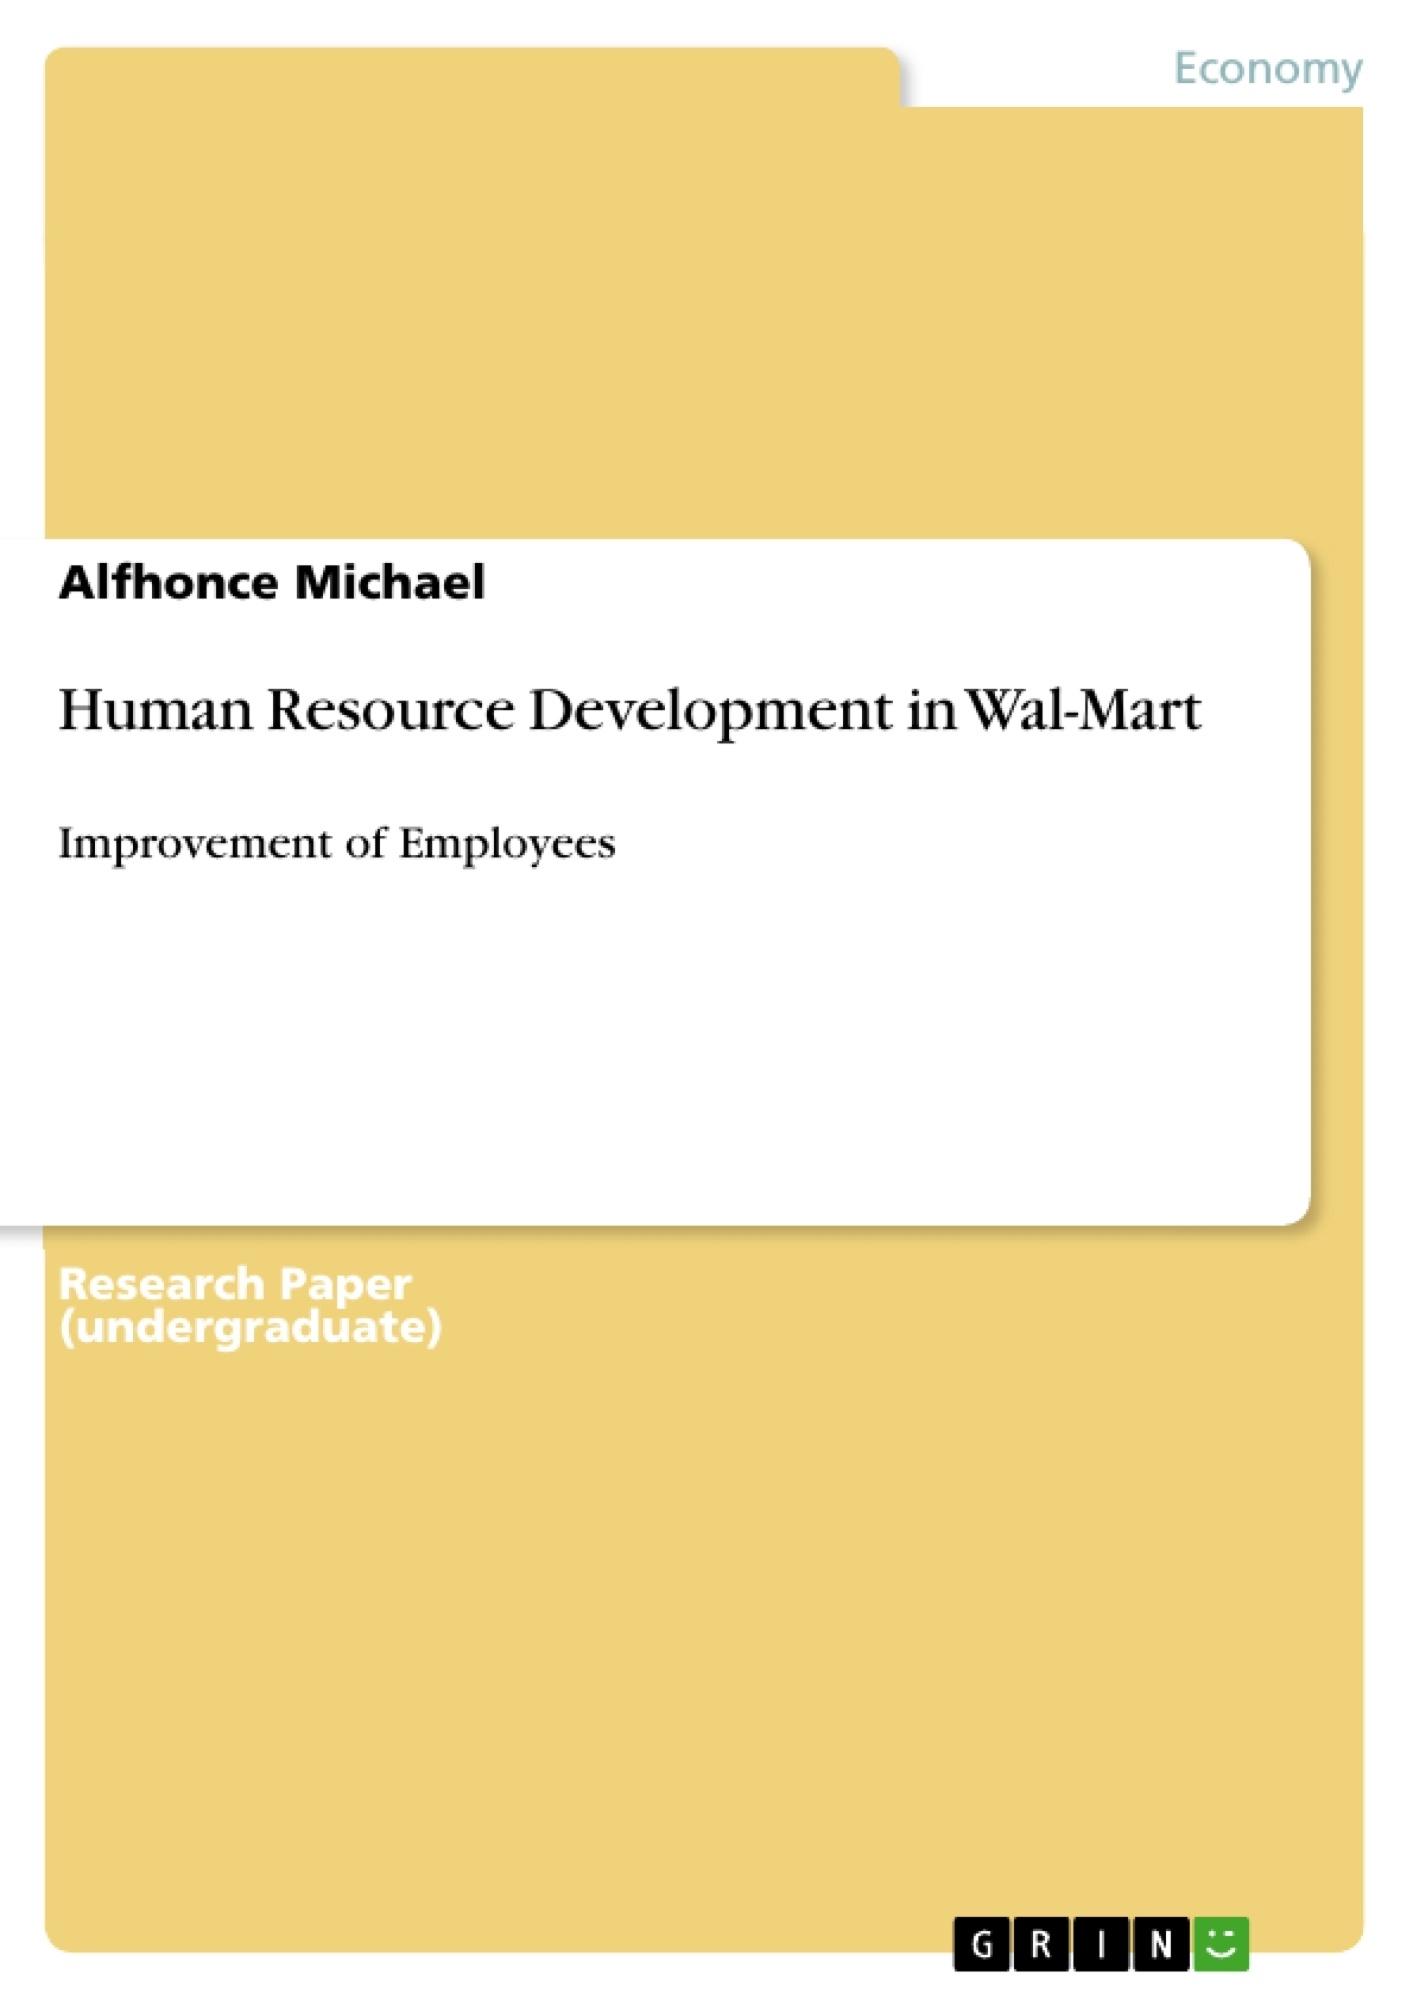 Title: Human Resource Development in Wal-Mart